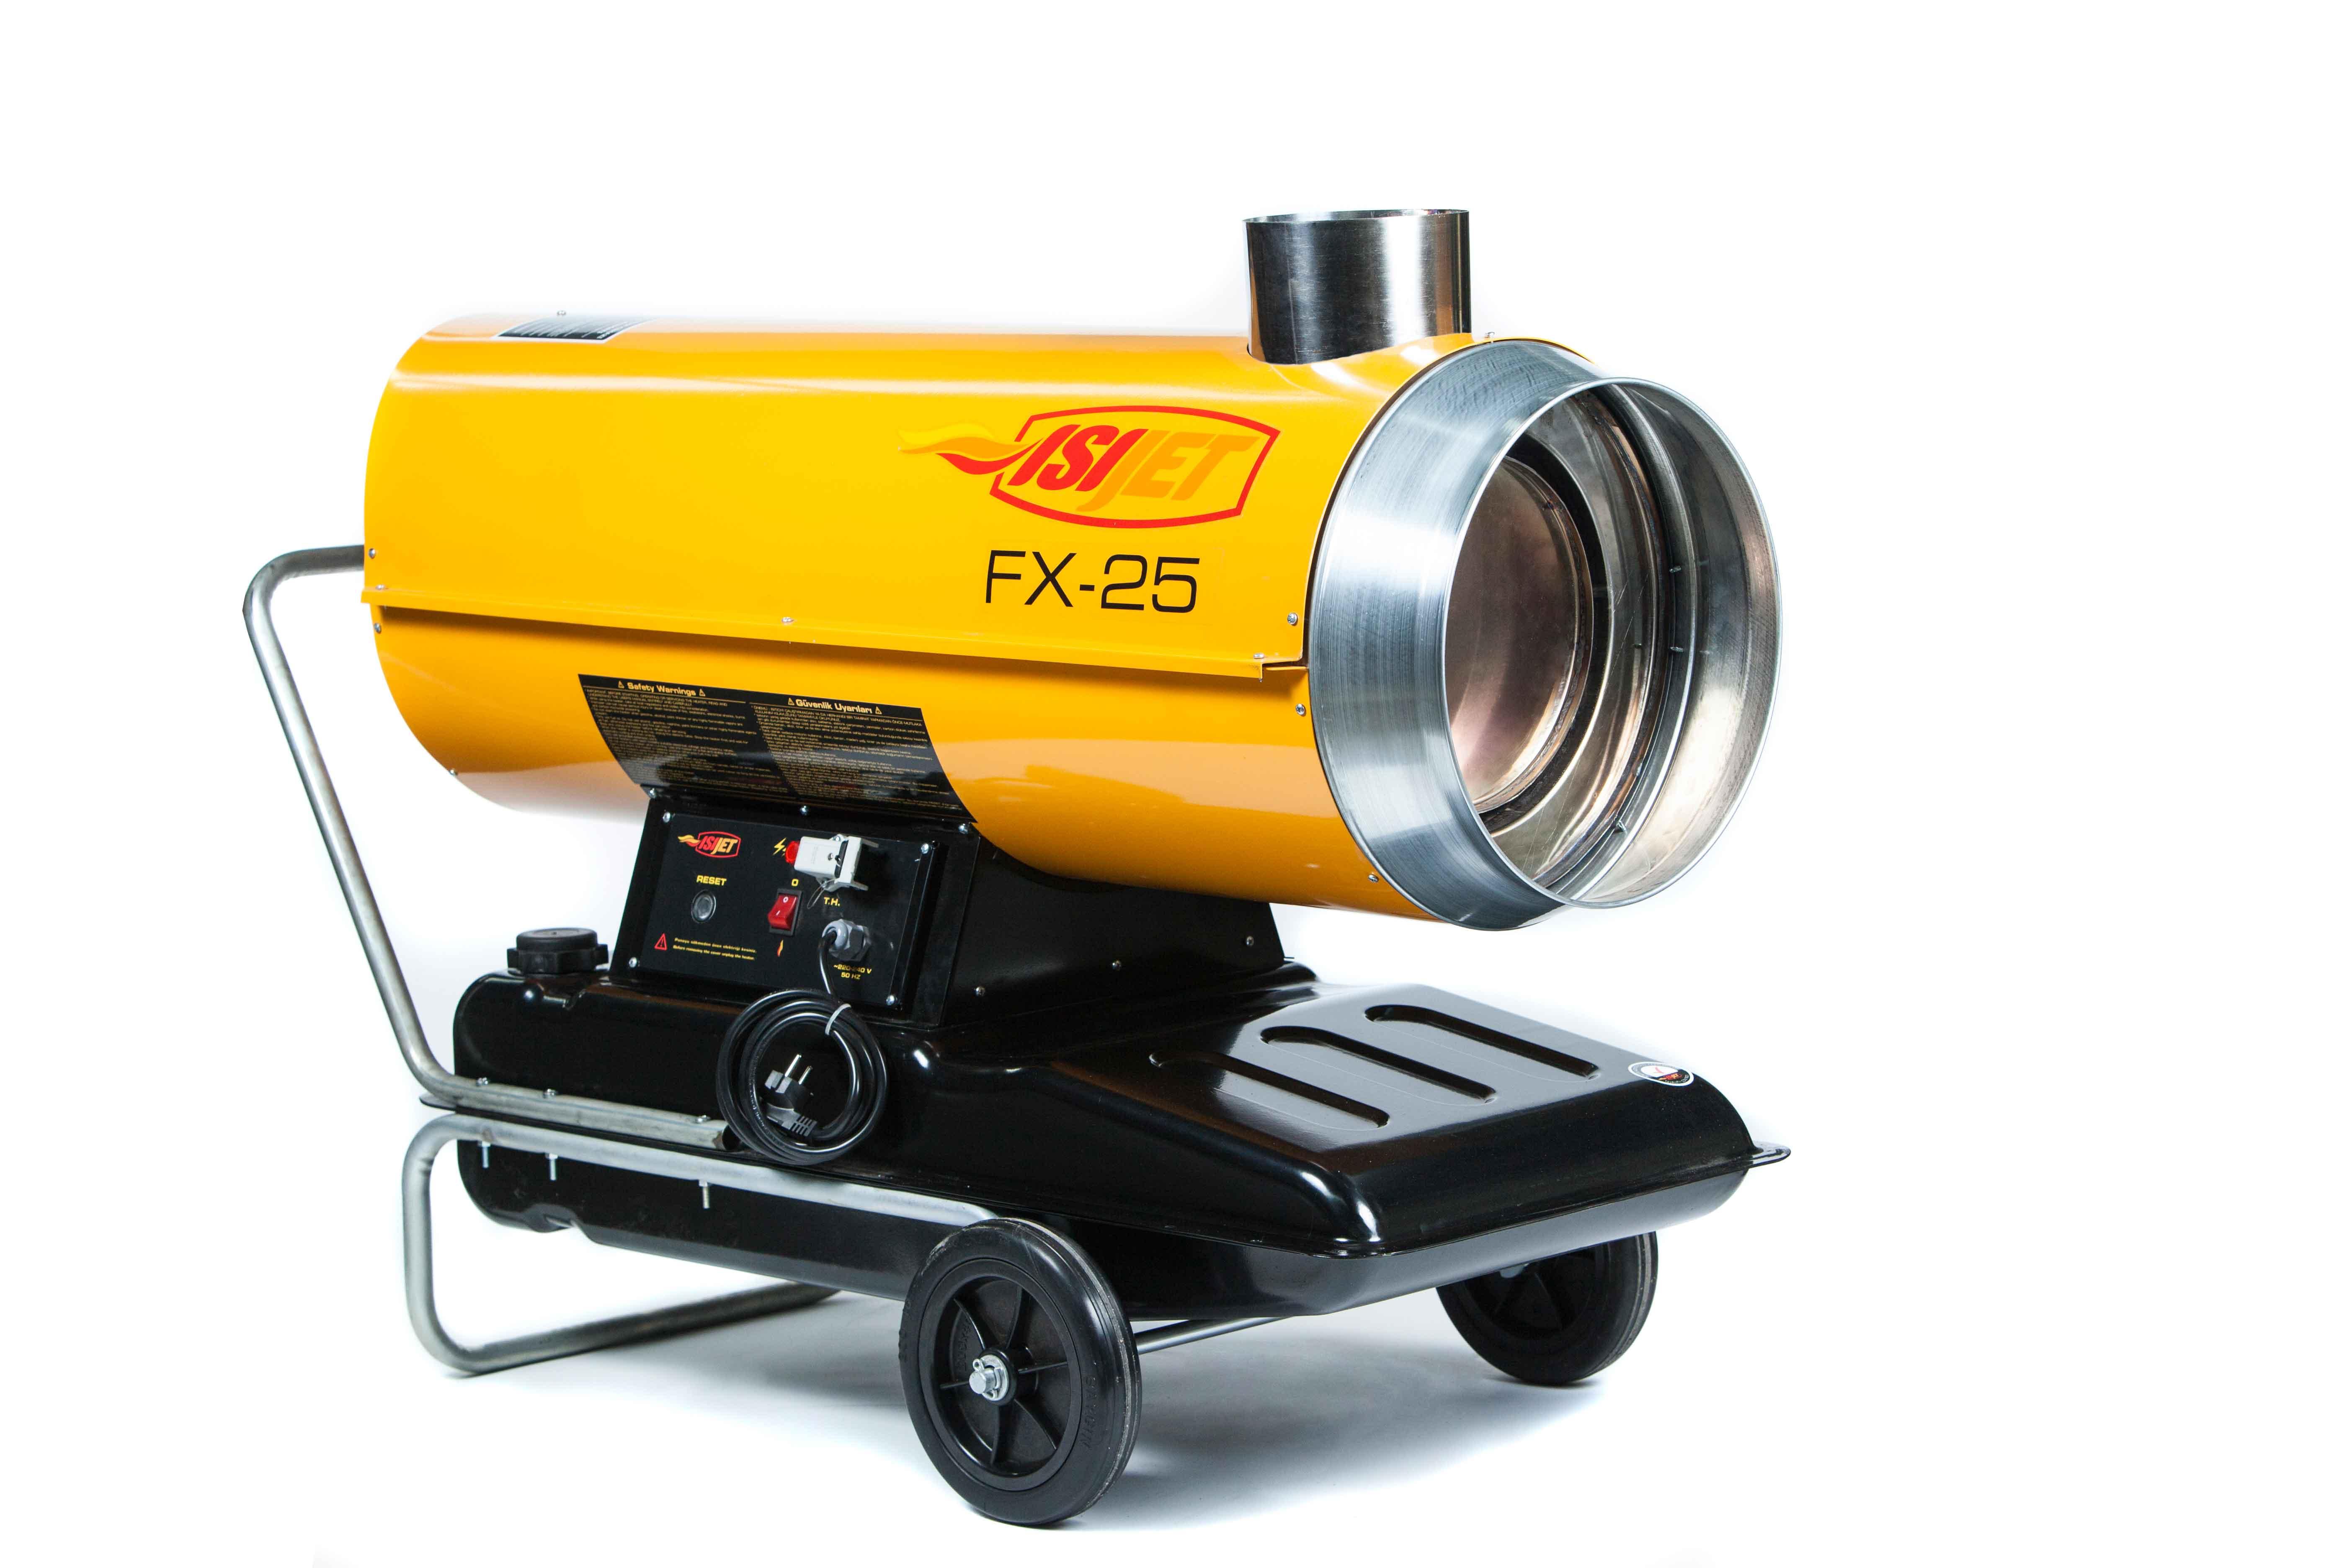 FX-25